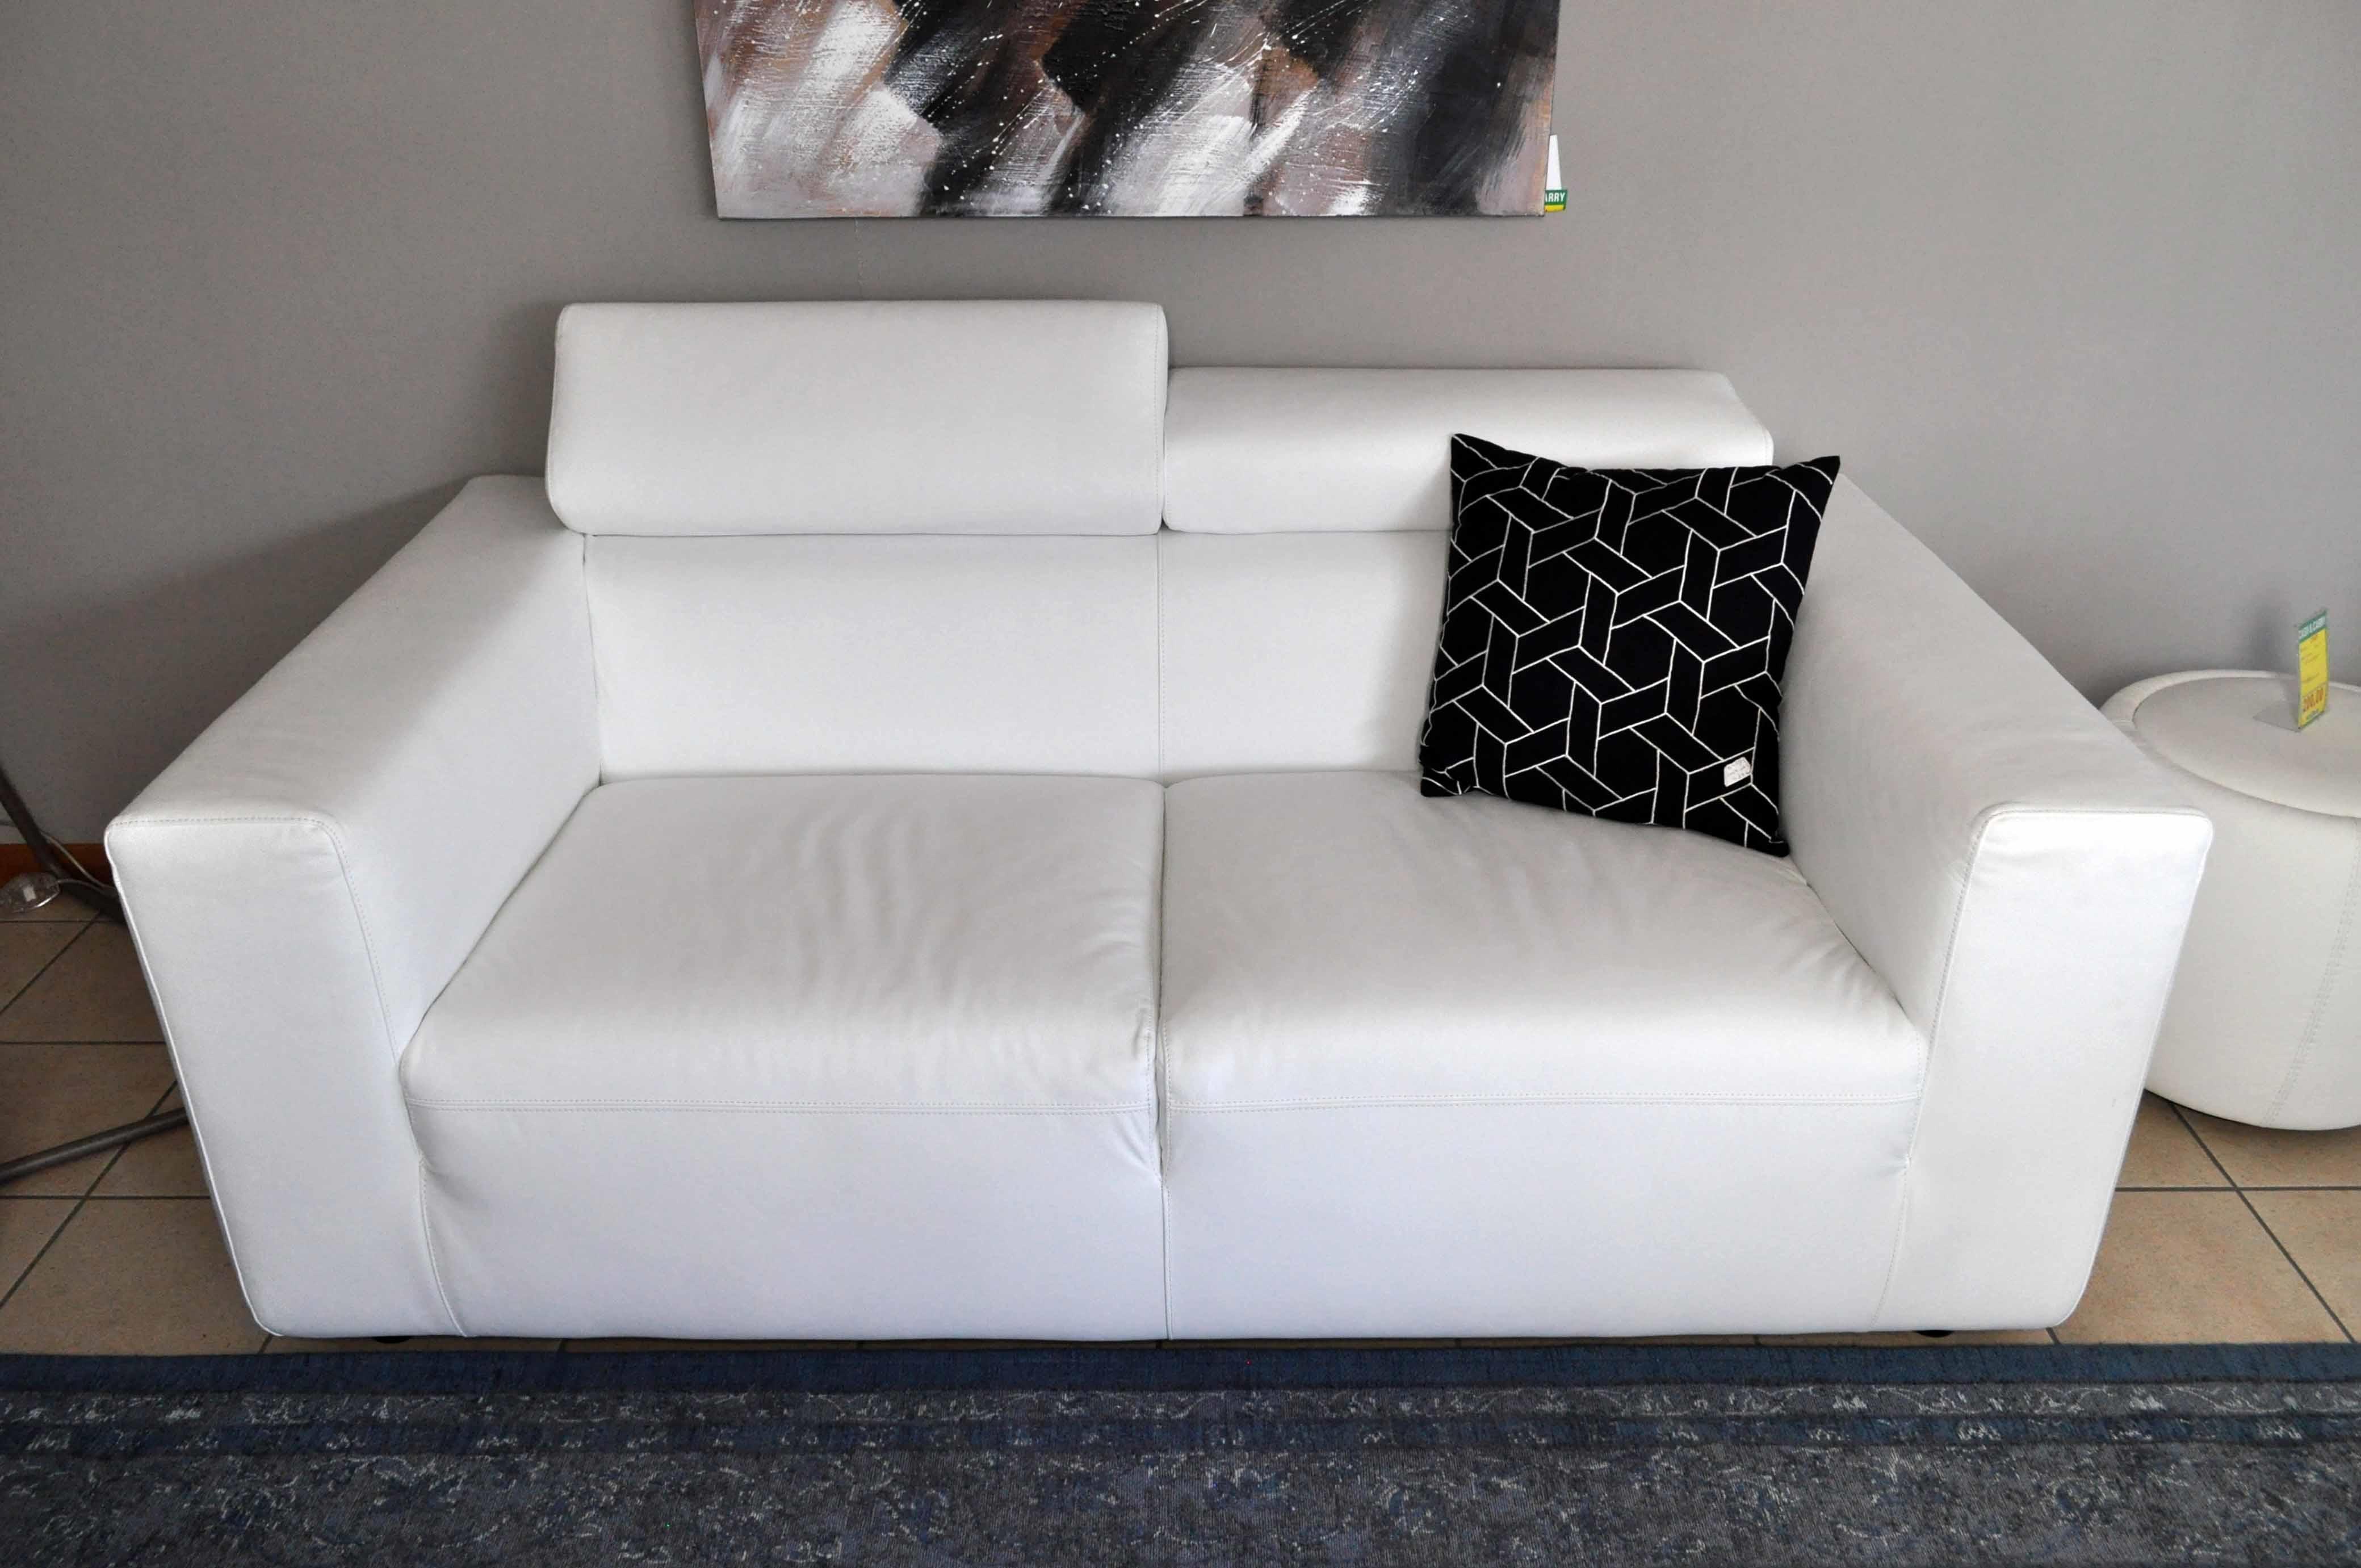 Calligaris divano Upgrade in vera pelle bianco sottocosto ...